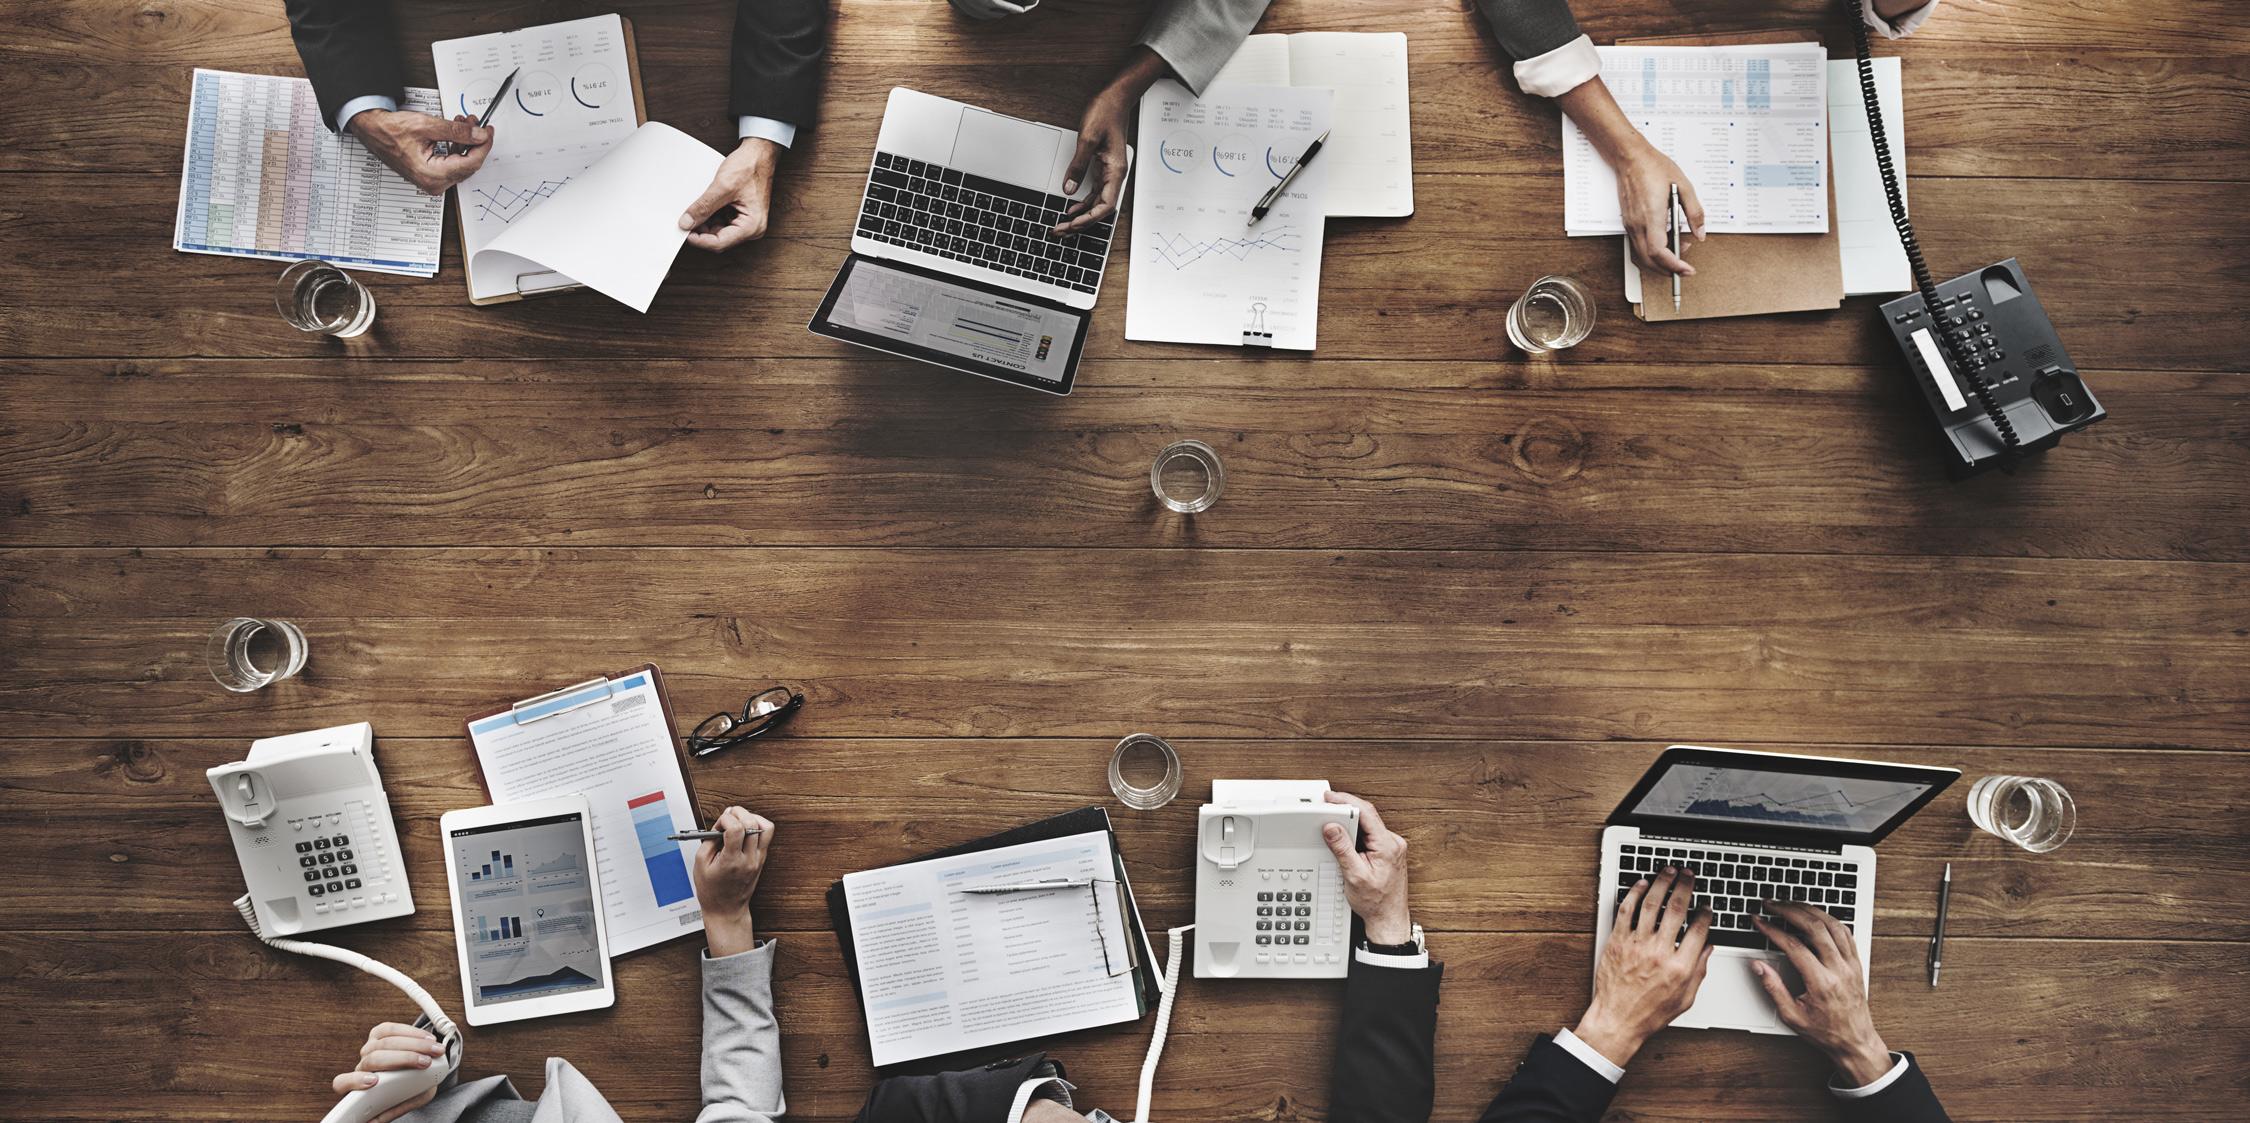 6 Tips for Managing Ads Across Multiple Platforms